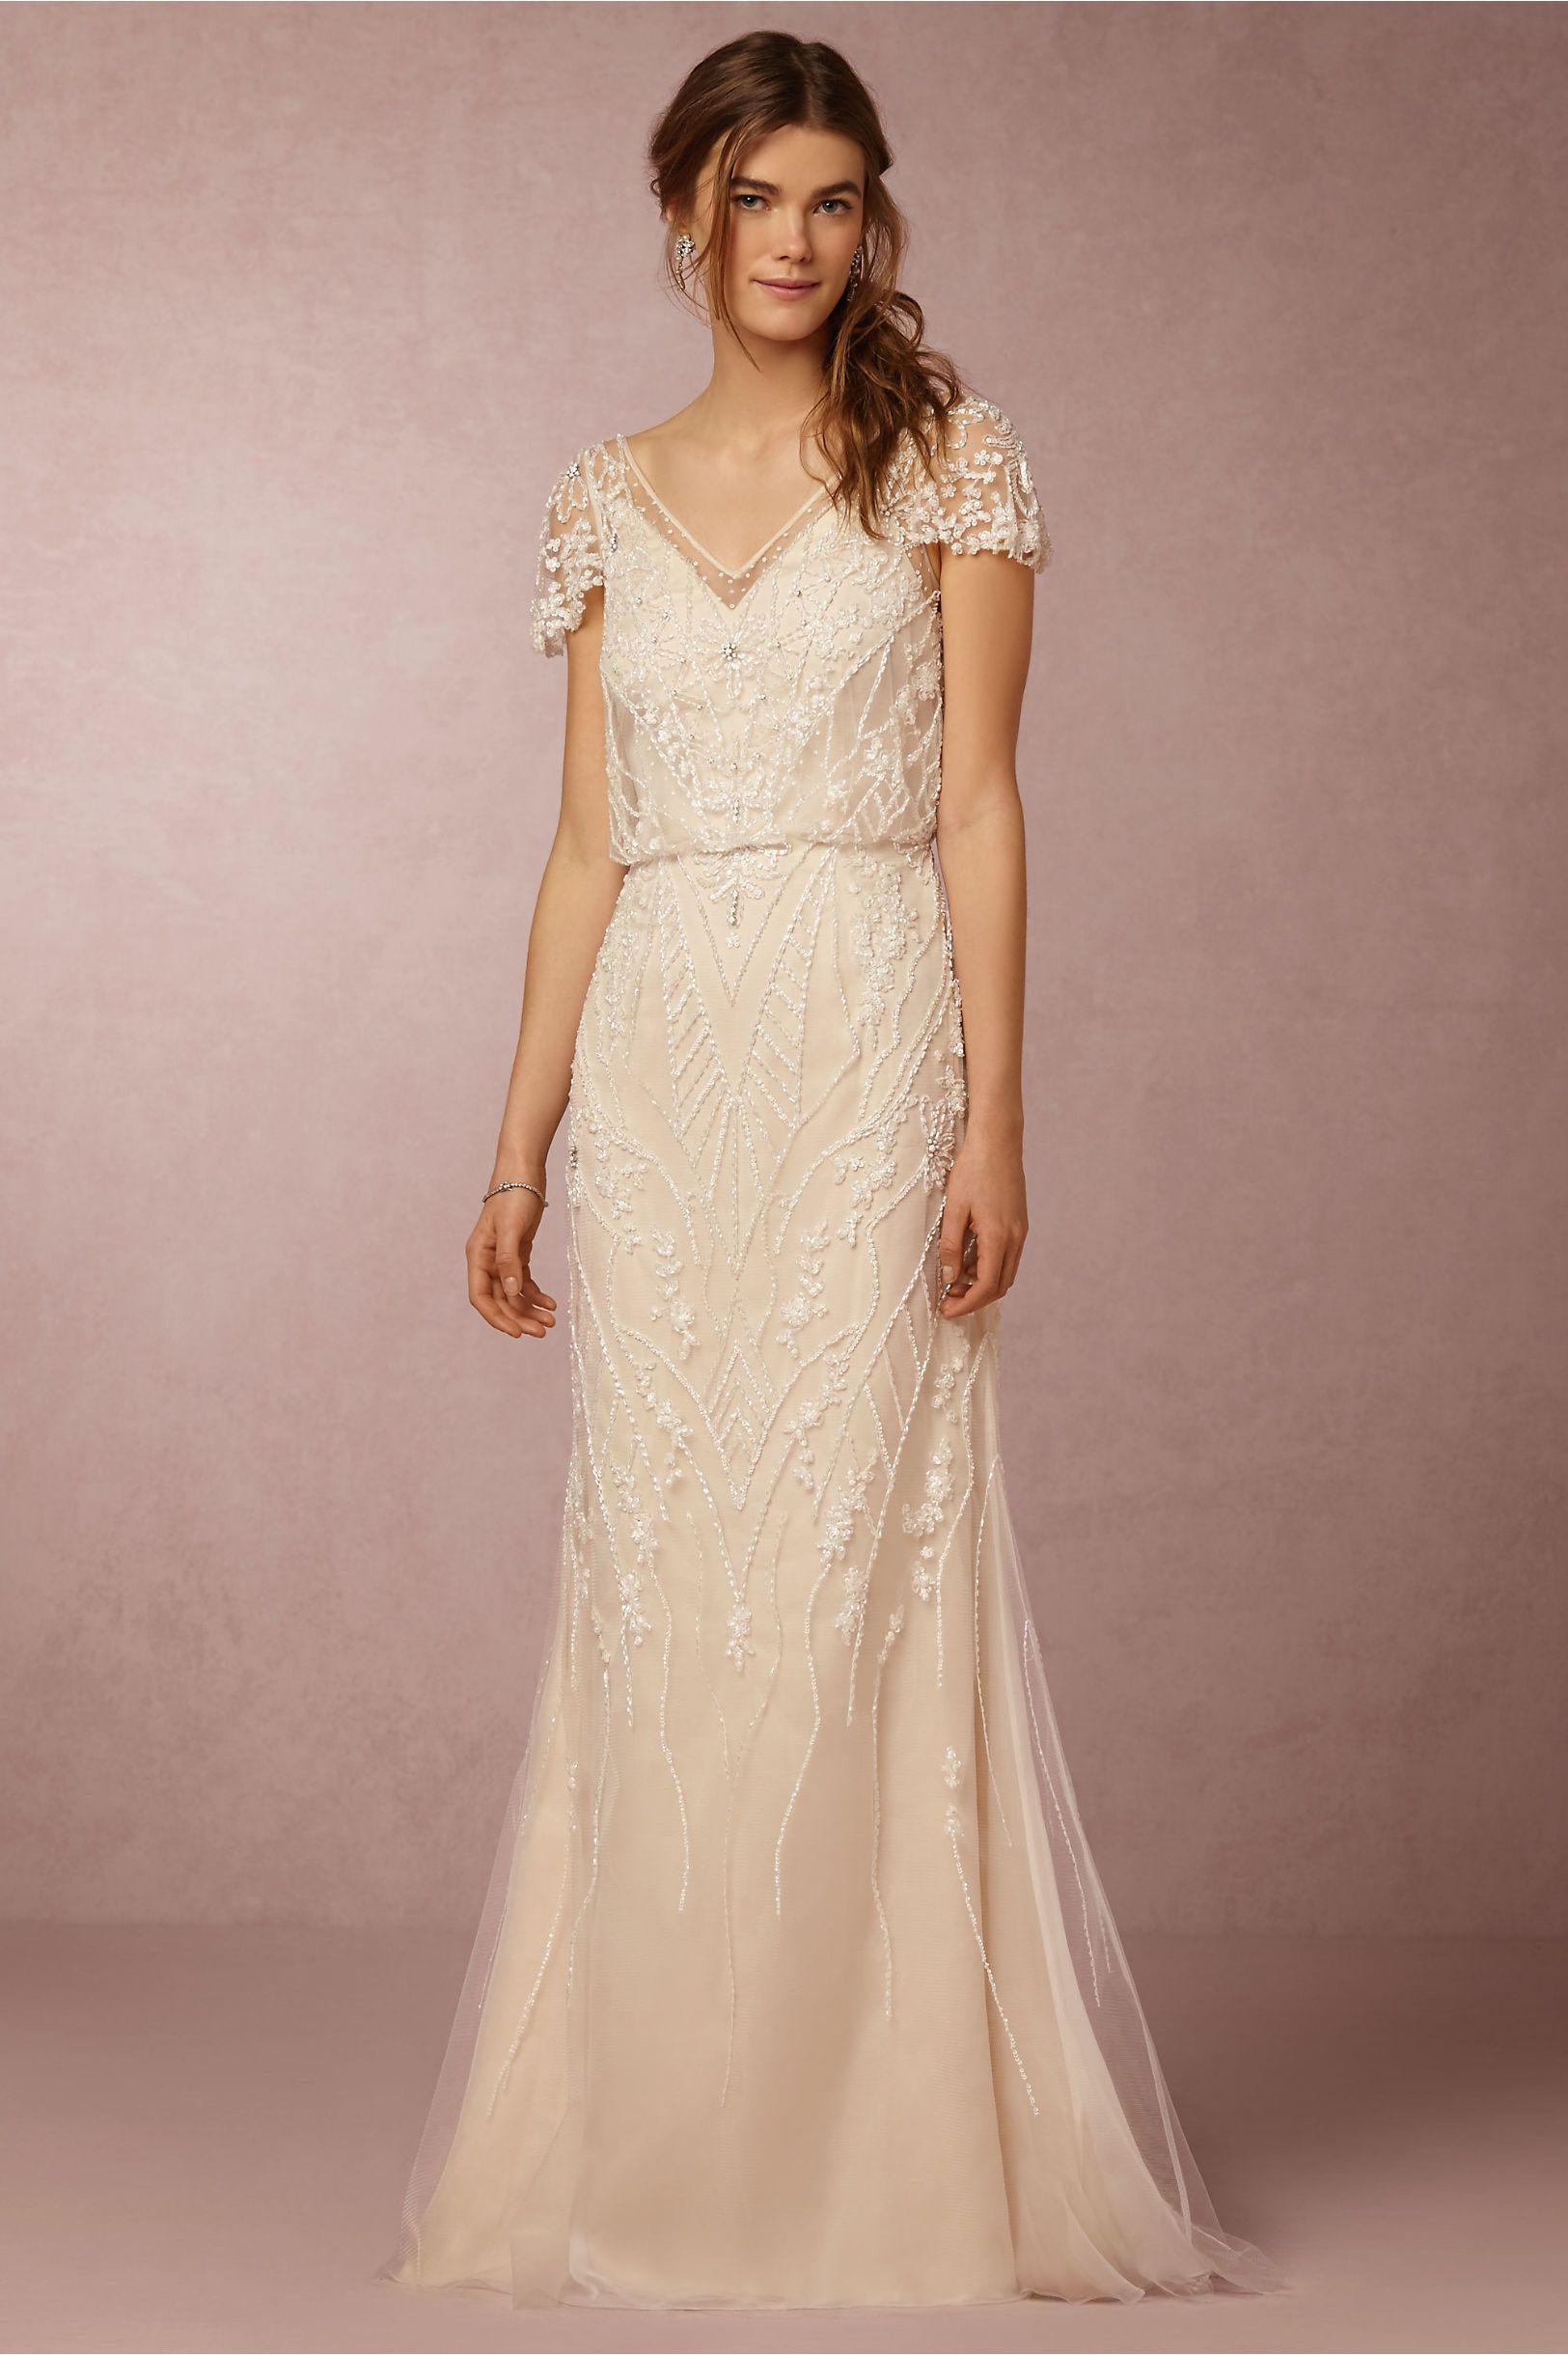 50 Gorgeous Wedding Dresses You Won T Believe Cost Less Than 1 000 Wedding Dress Brands Wedding Dresses Gorgeous Wedding Dress